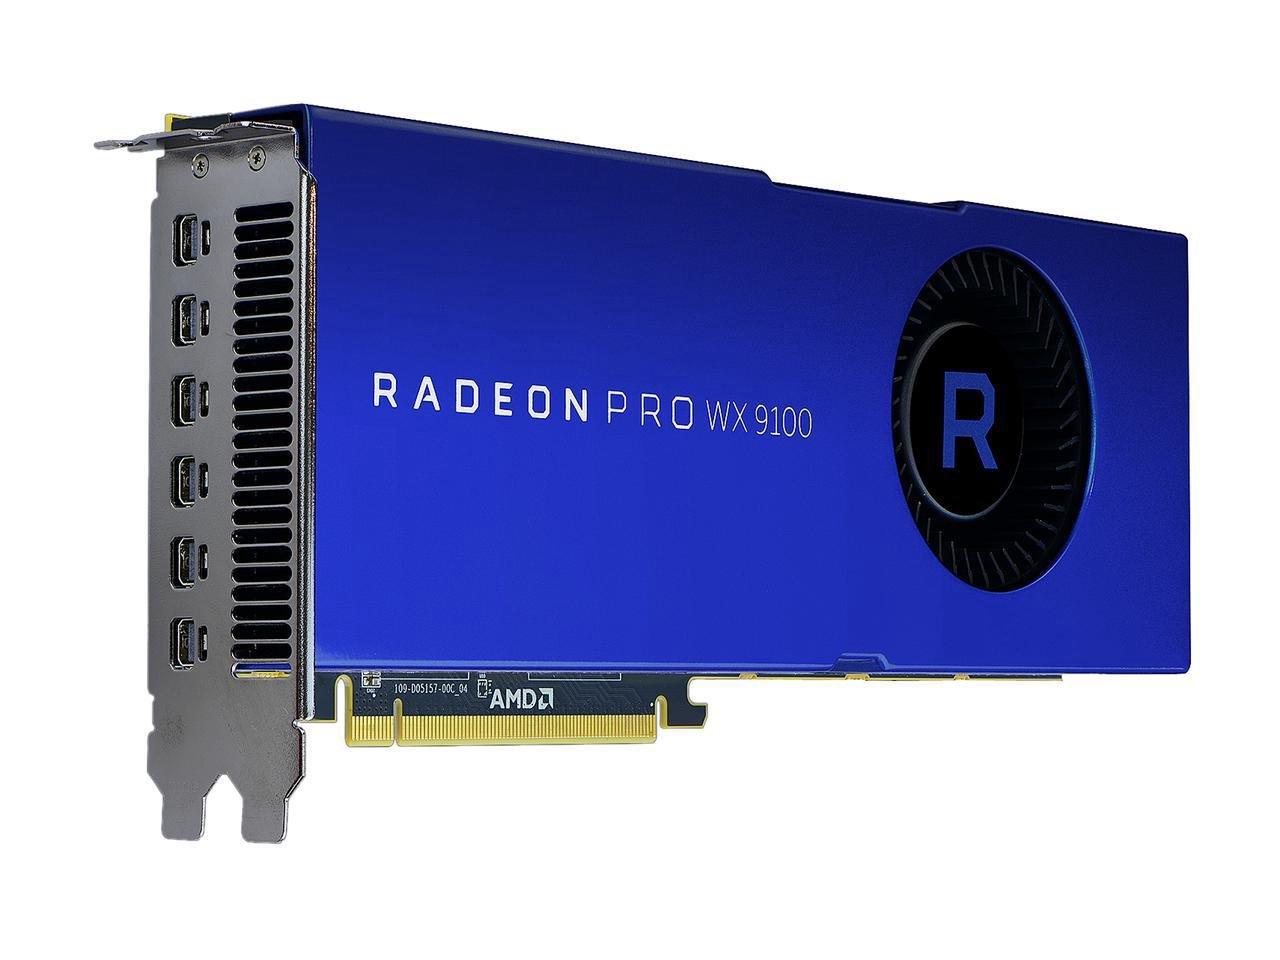 AMD Radeon Pro WX 9100 Graphic Card - 1.50 GHz Core - 16 GB